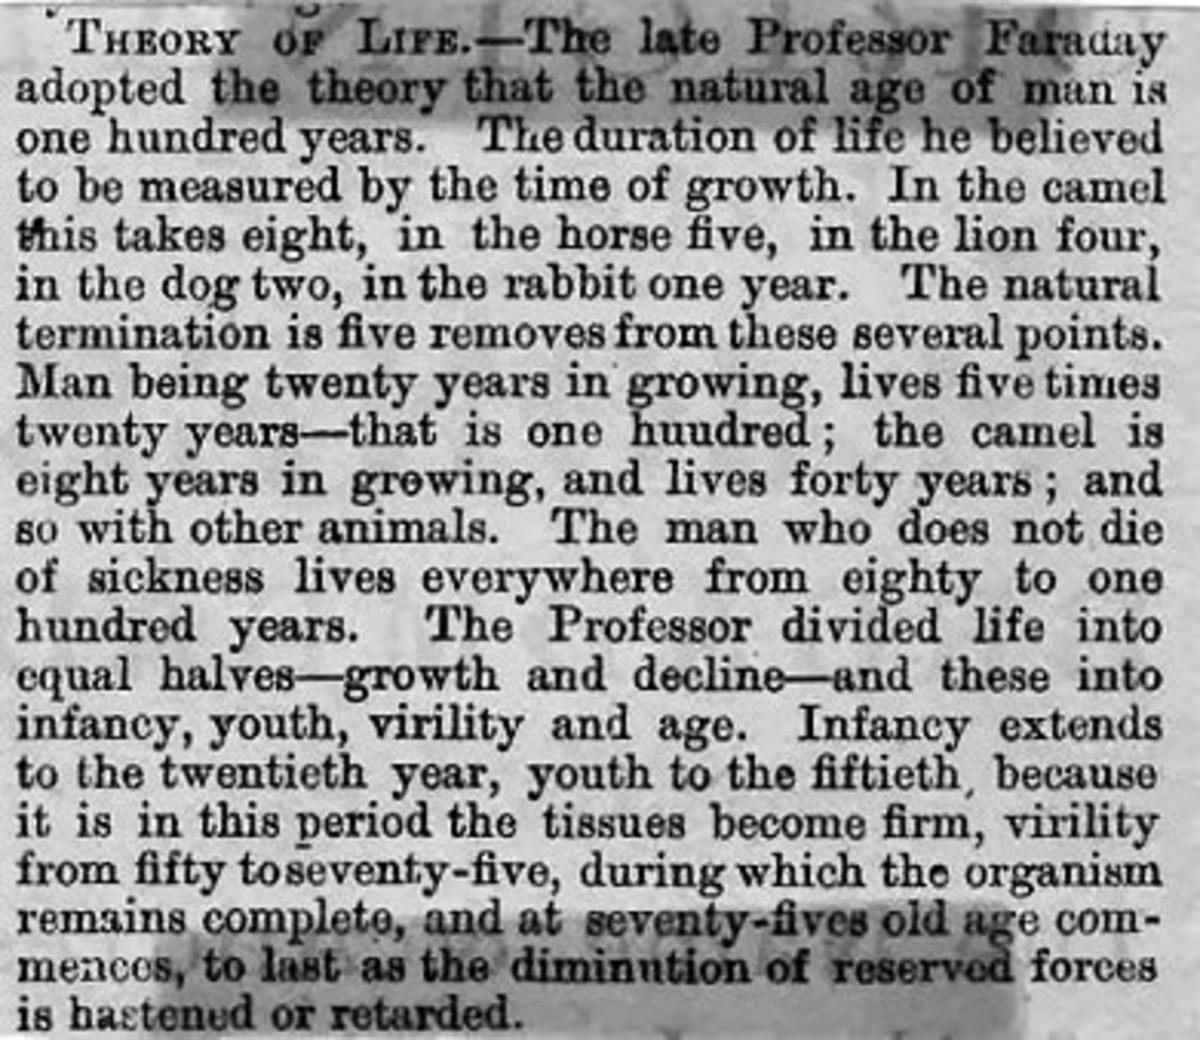 Theory of Life by Professor Faraday